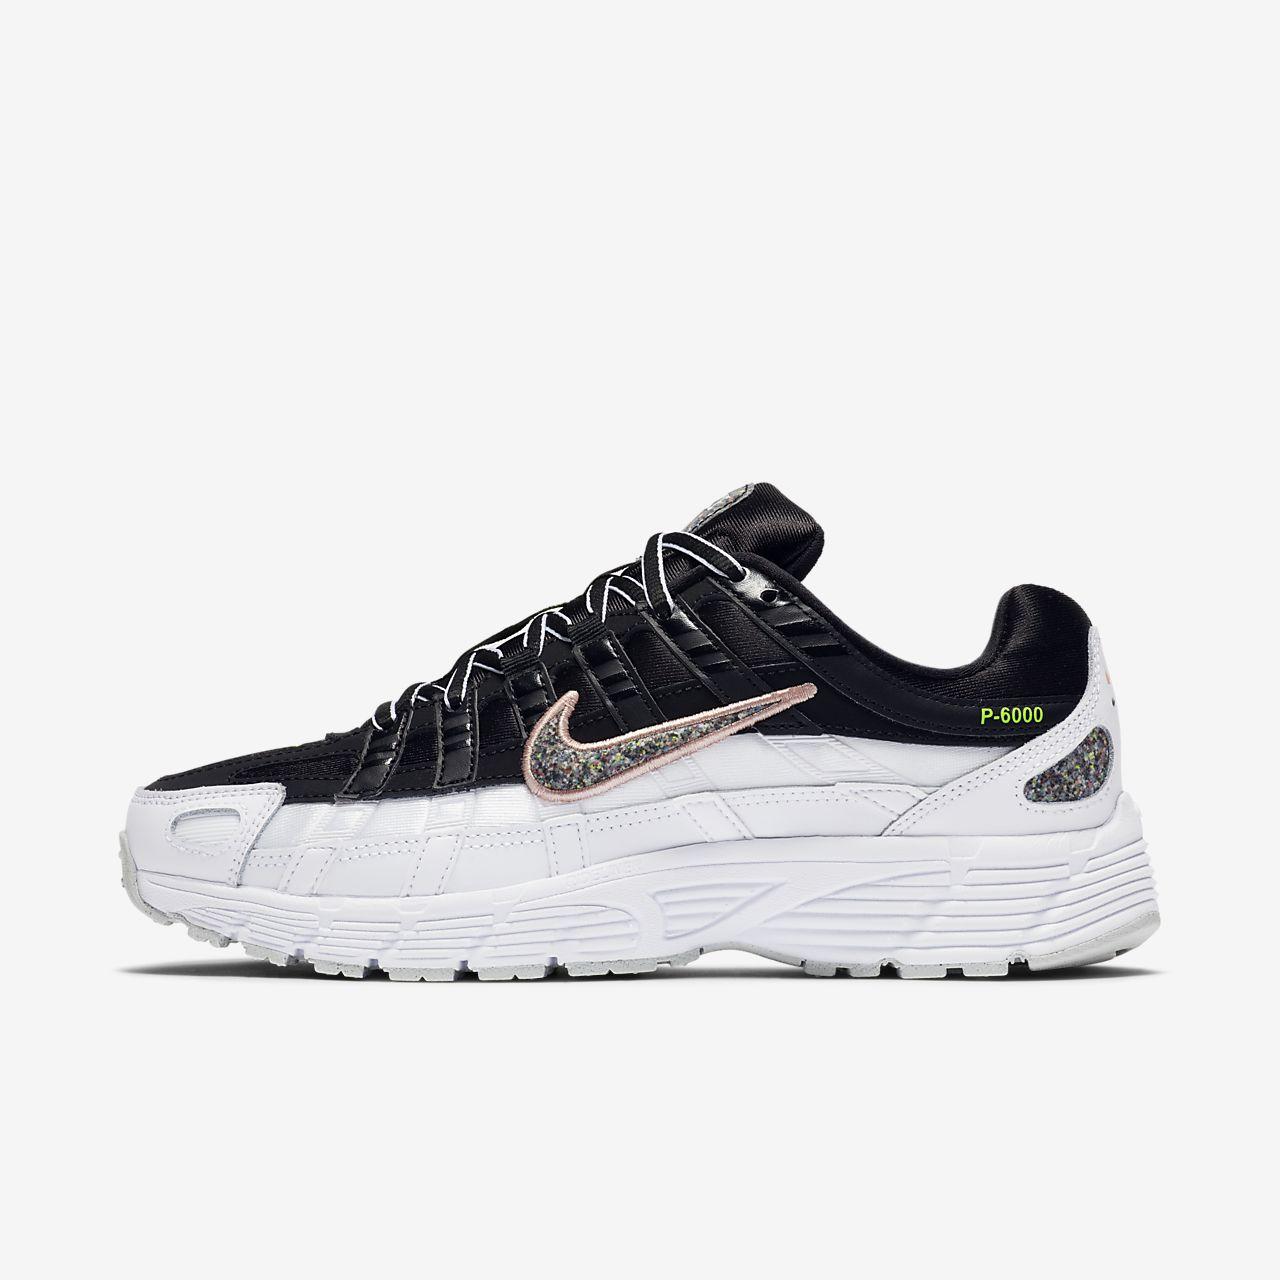 Scarpa Nike P-6000 SE - Donna